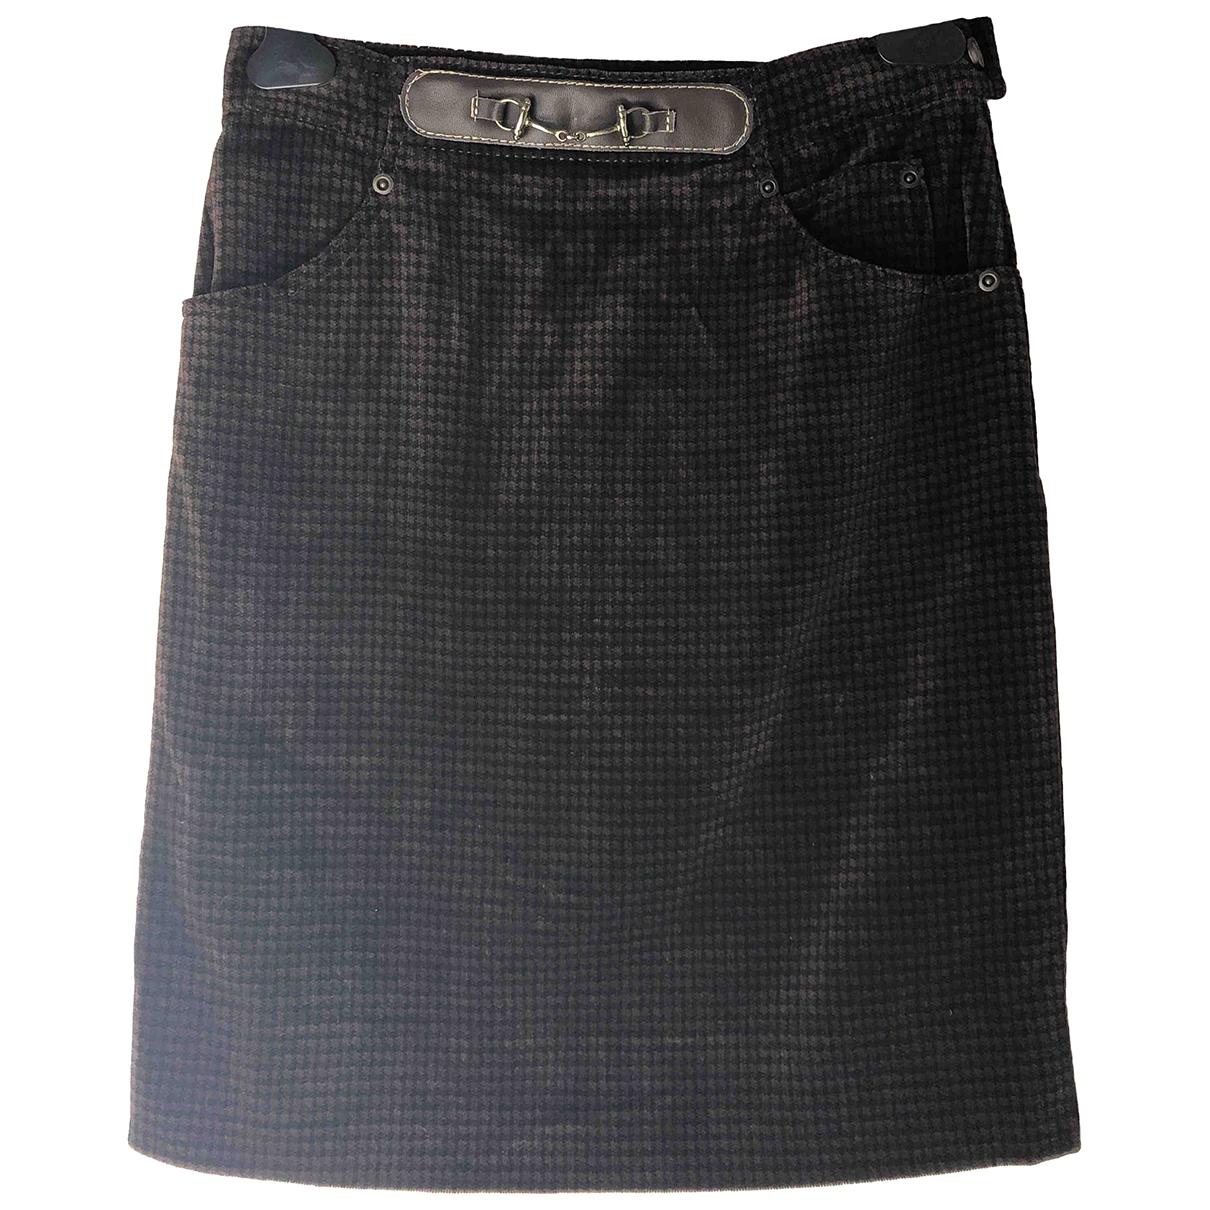 Pierre Cardin - Jupe   pour femme en velours - marron